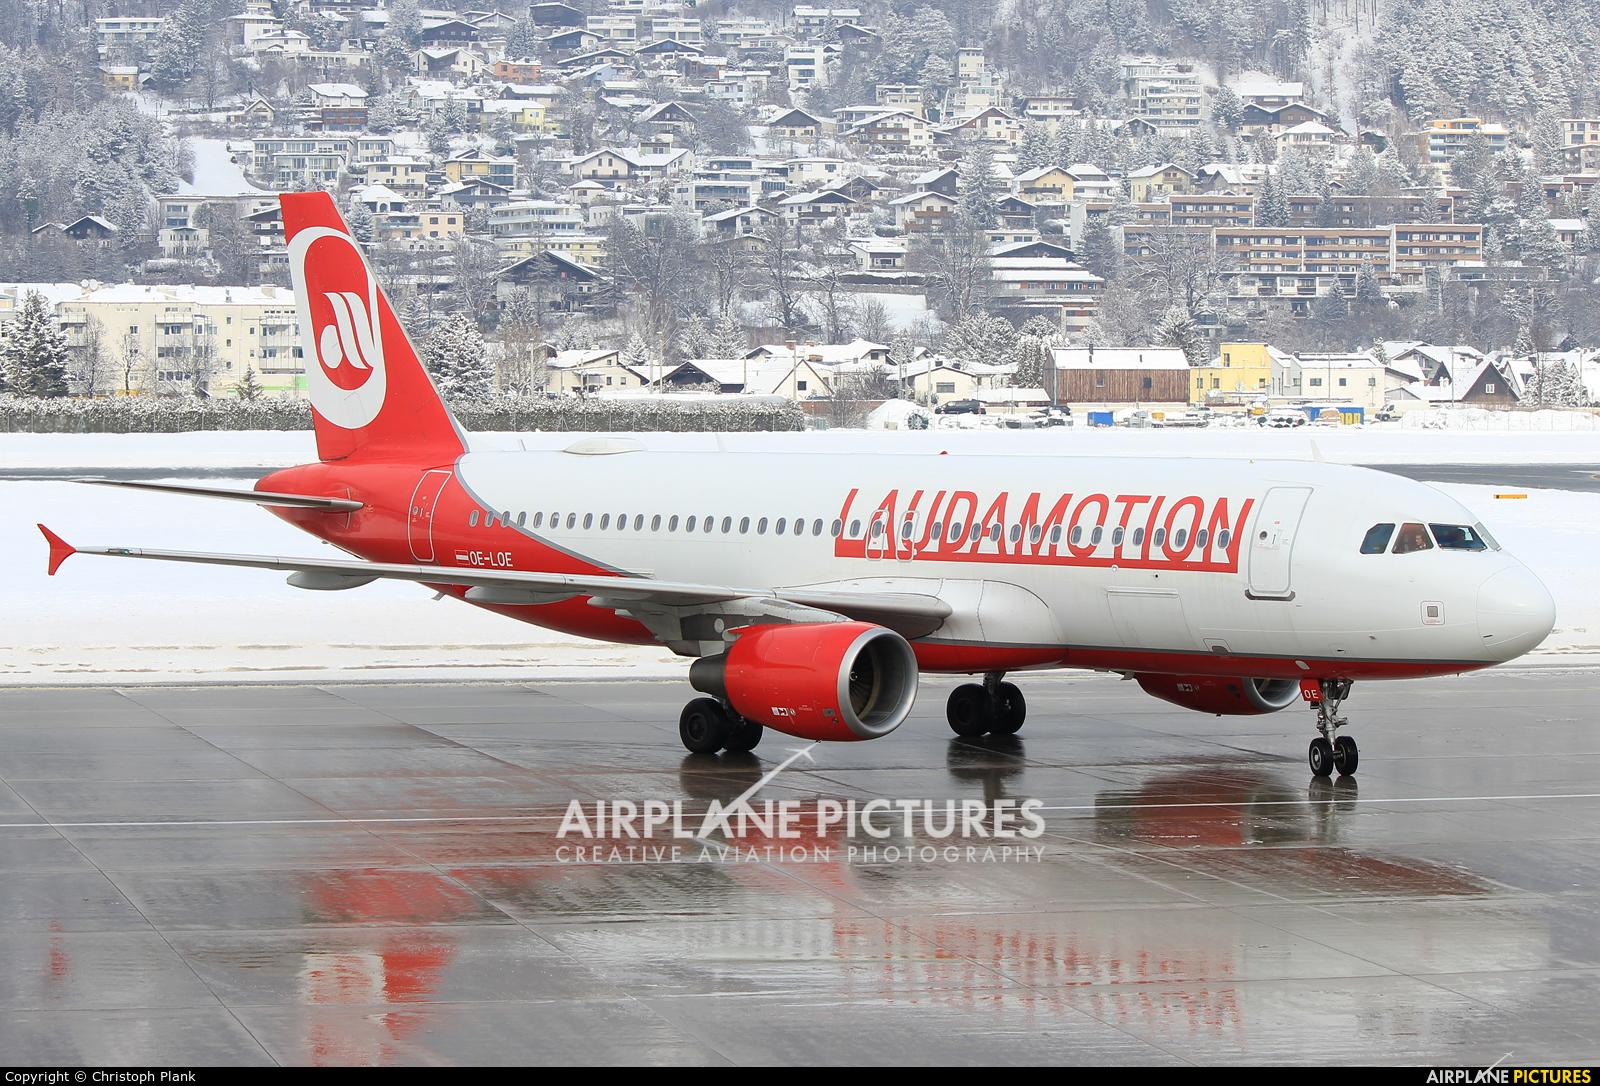 LaudaMotion OE-LOE aircraft at Innsbruck